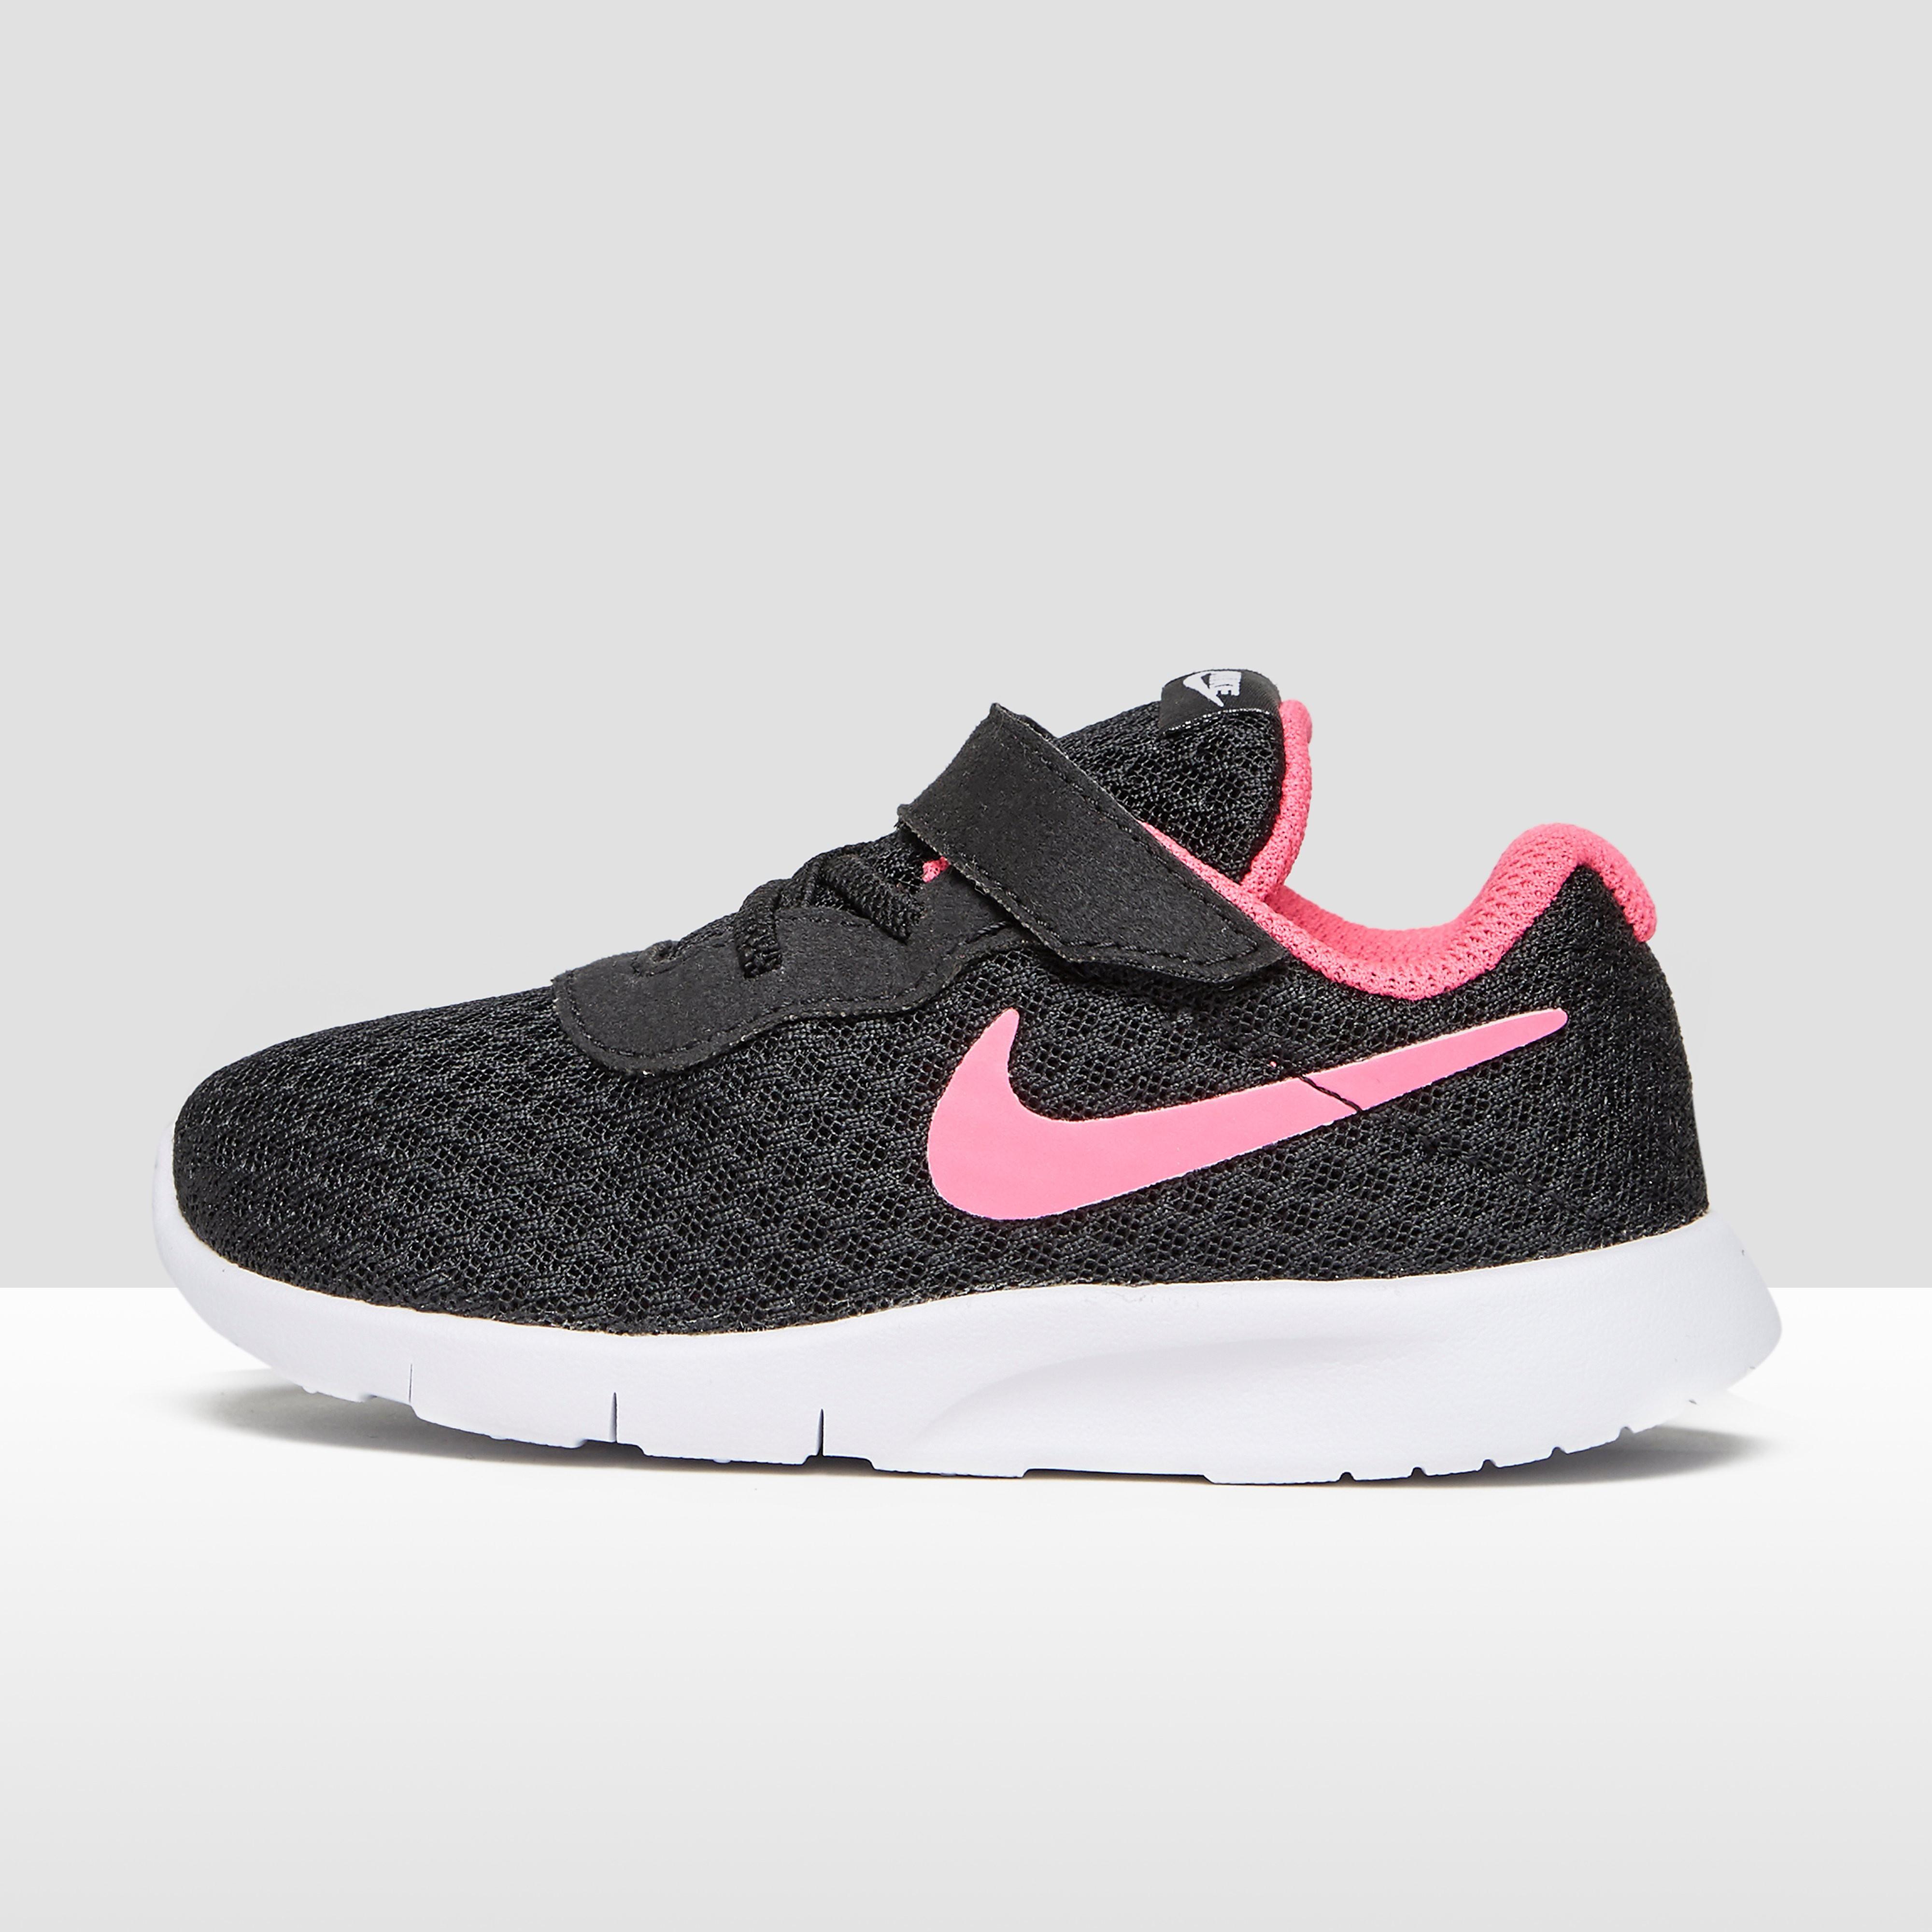 Nike Tanjun babysneaker zwart en roze